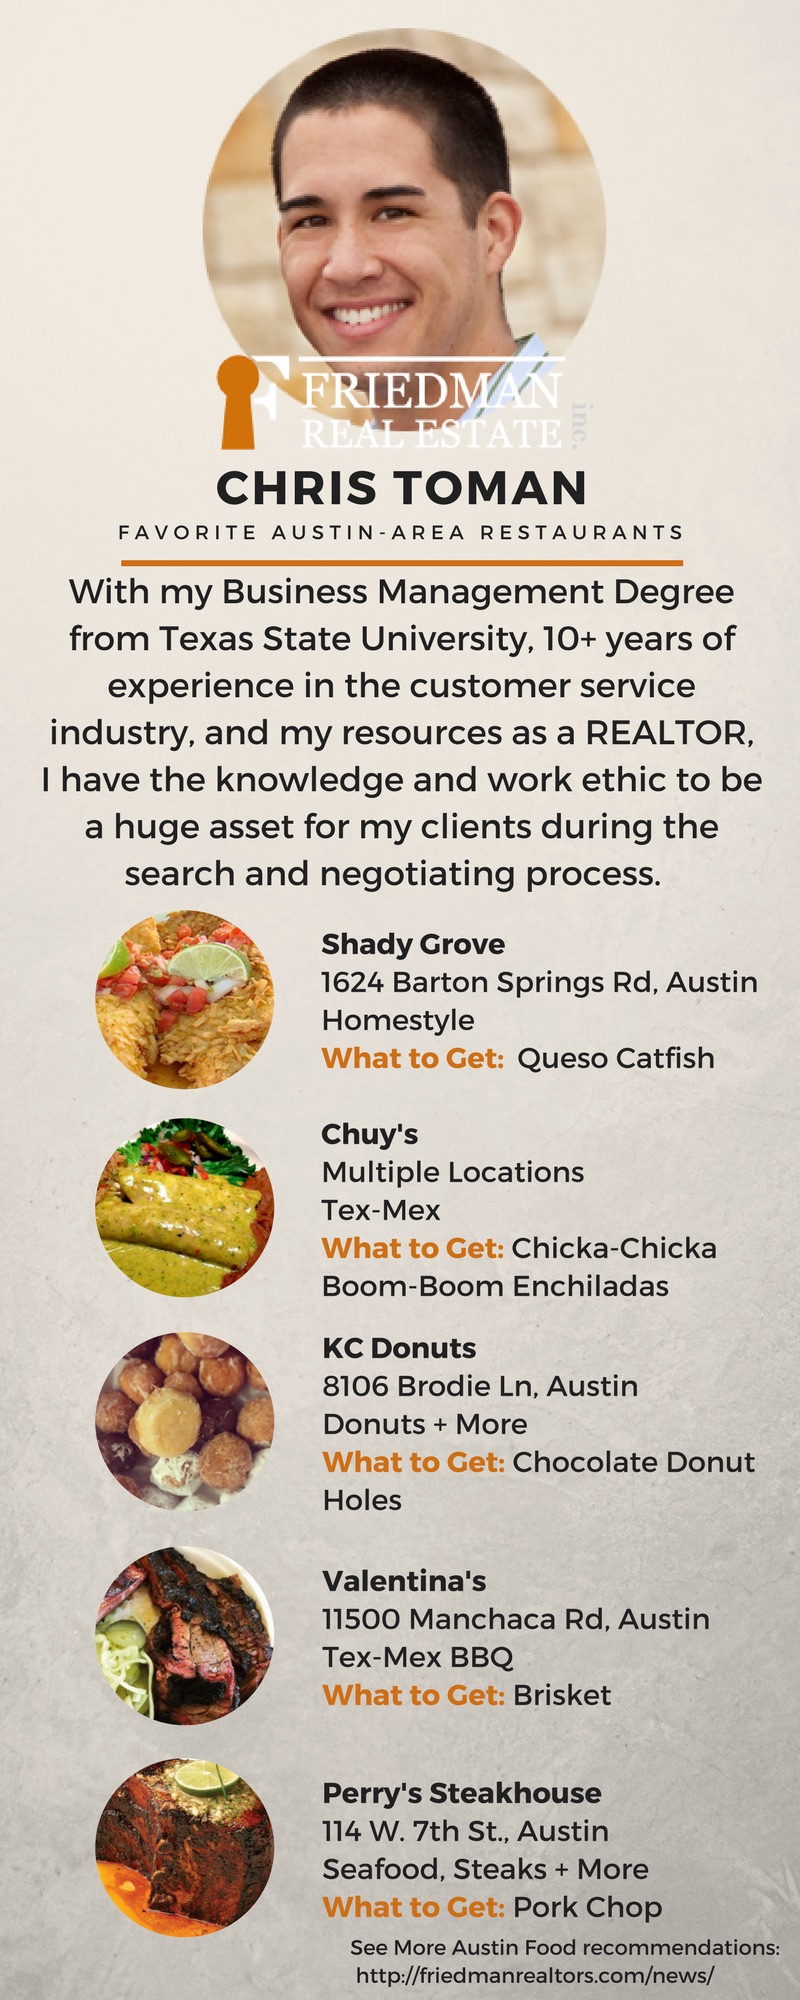 Best-Austin-Food-Chris-Toman-Friedman-Real-Estate